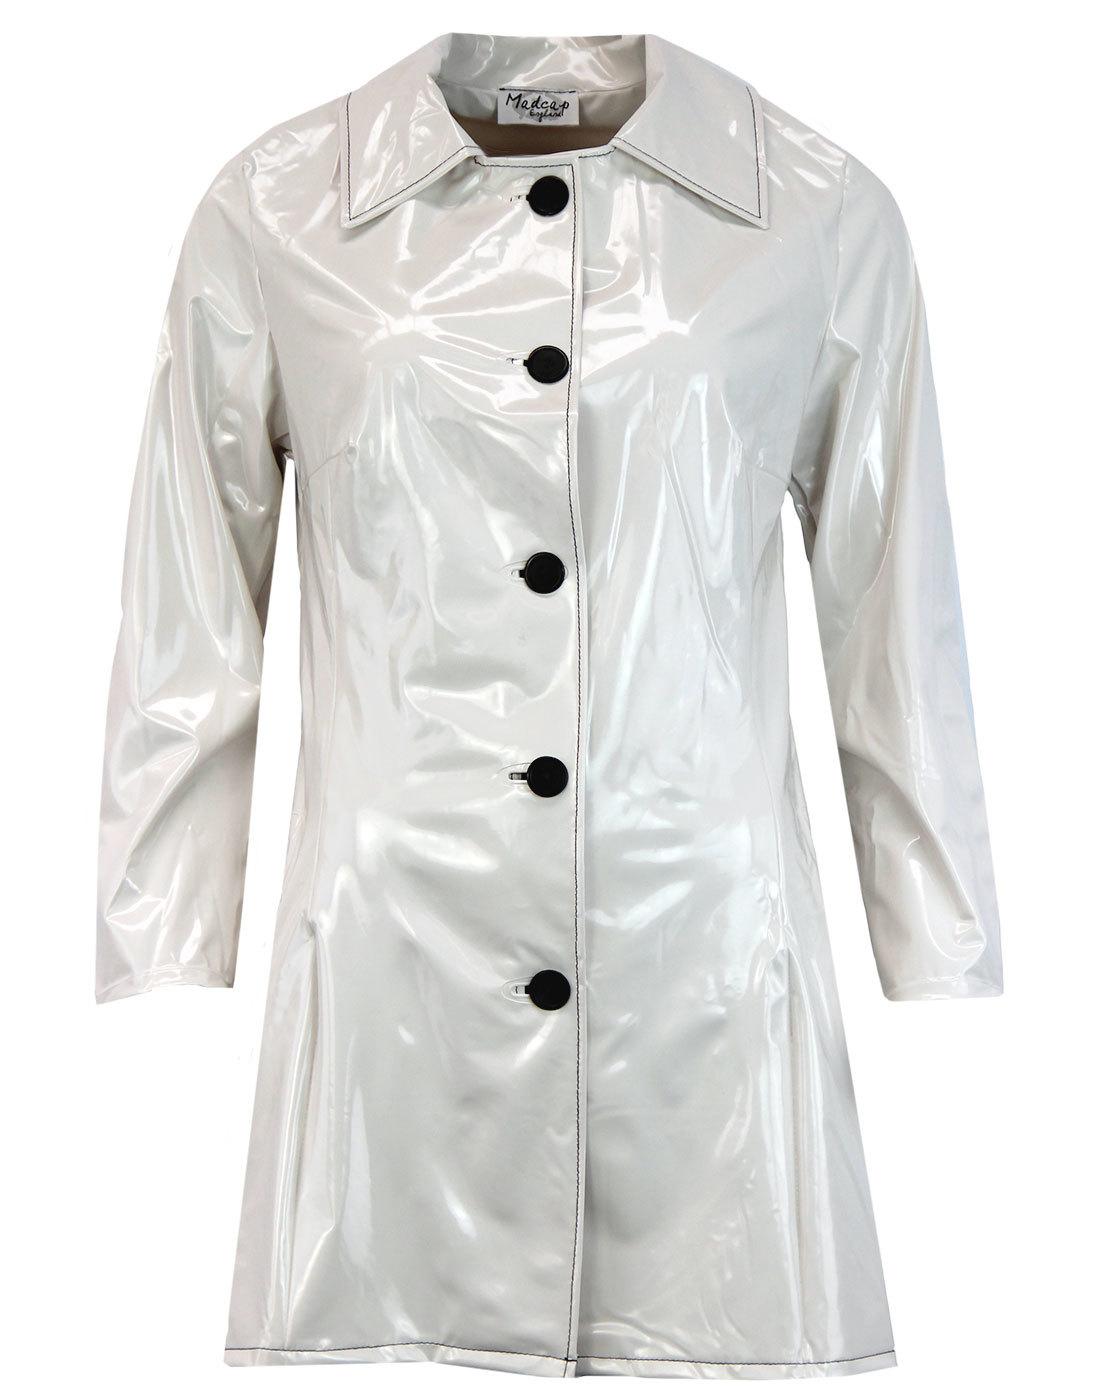 Jackie MADCAP Made in England Retro 60s Raincoat W